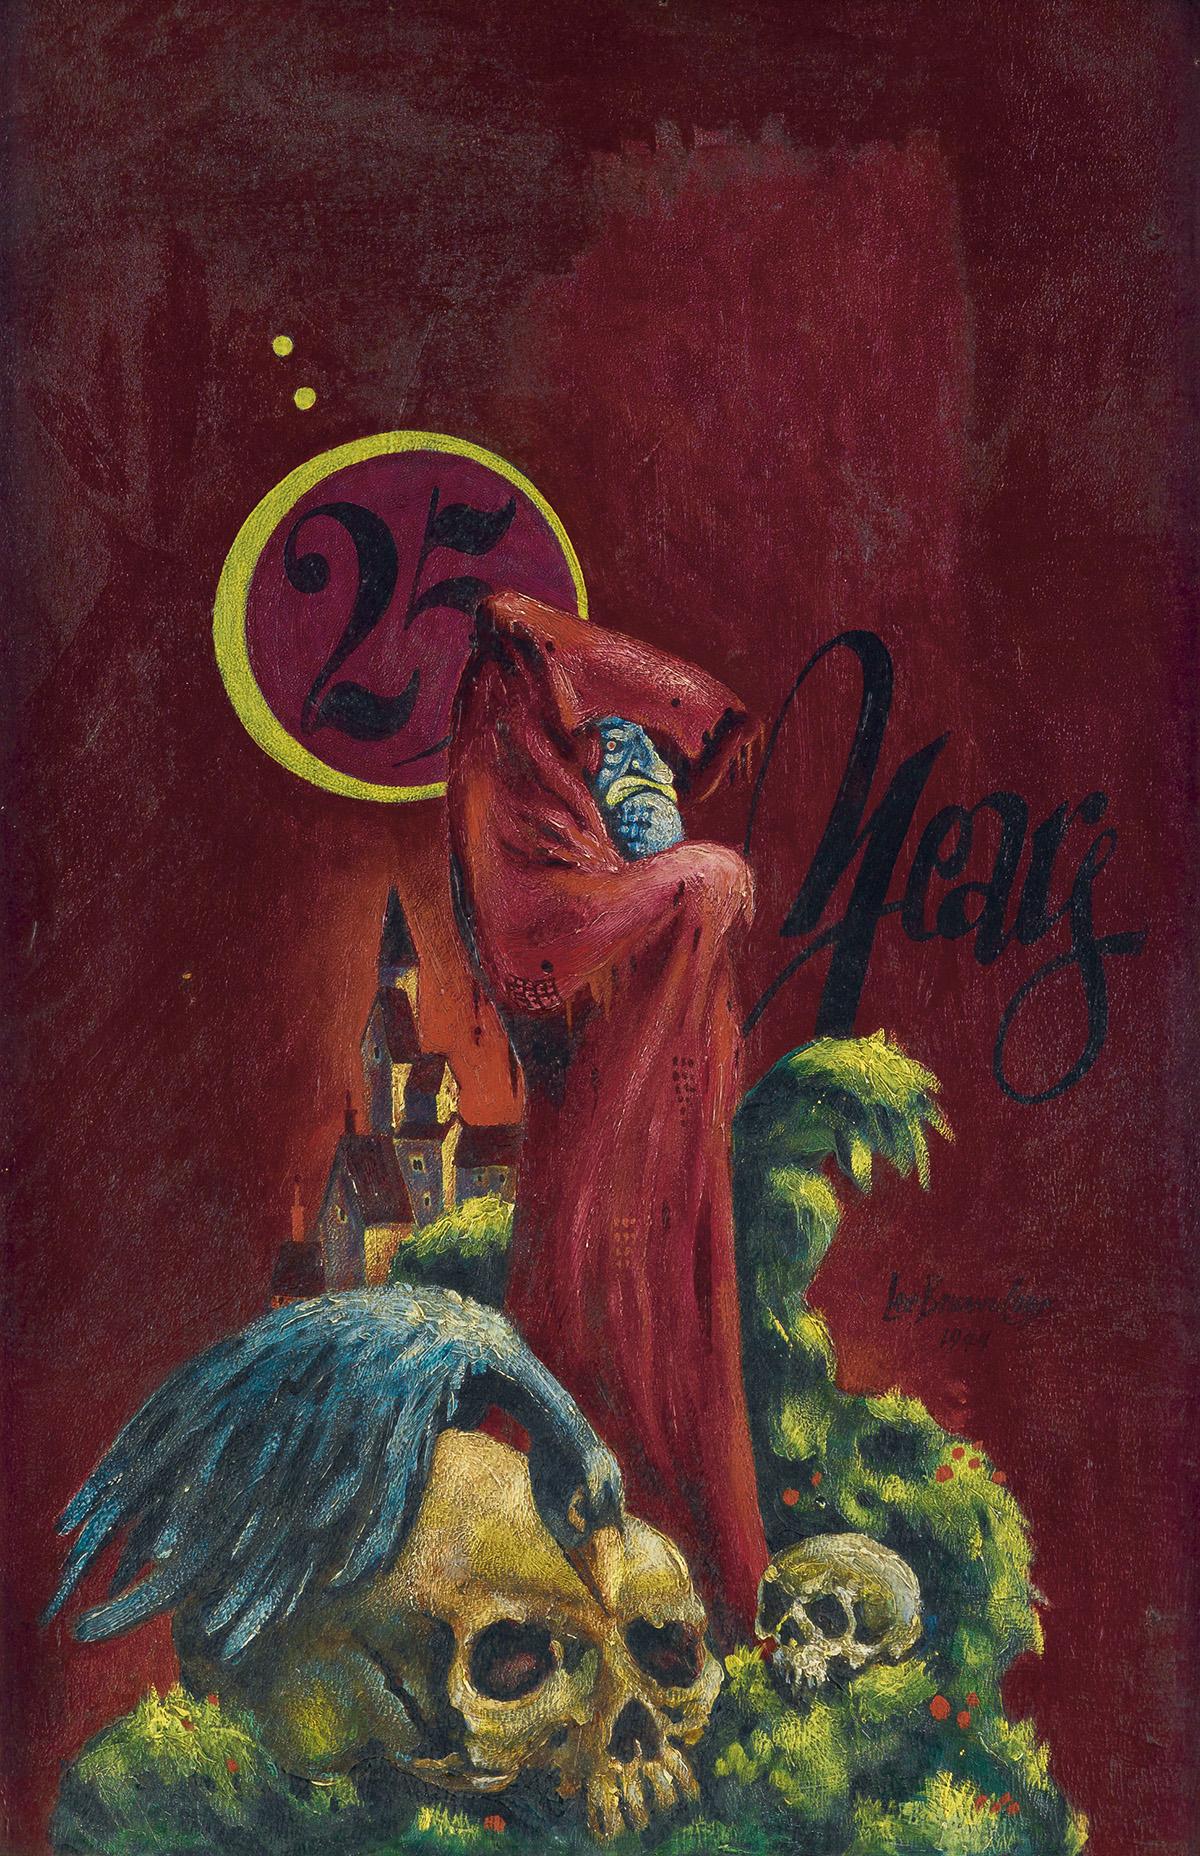 LEE BROWN COYE. (FANTASY / HORROR) Weird Tales Vol. 40, No. 3.